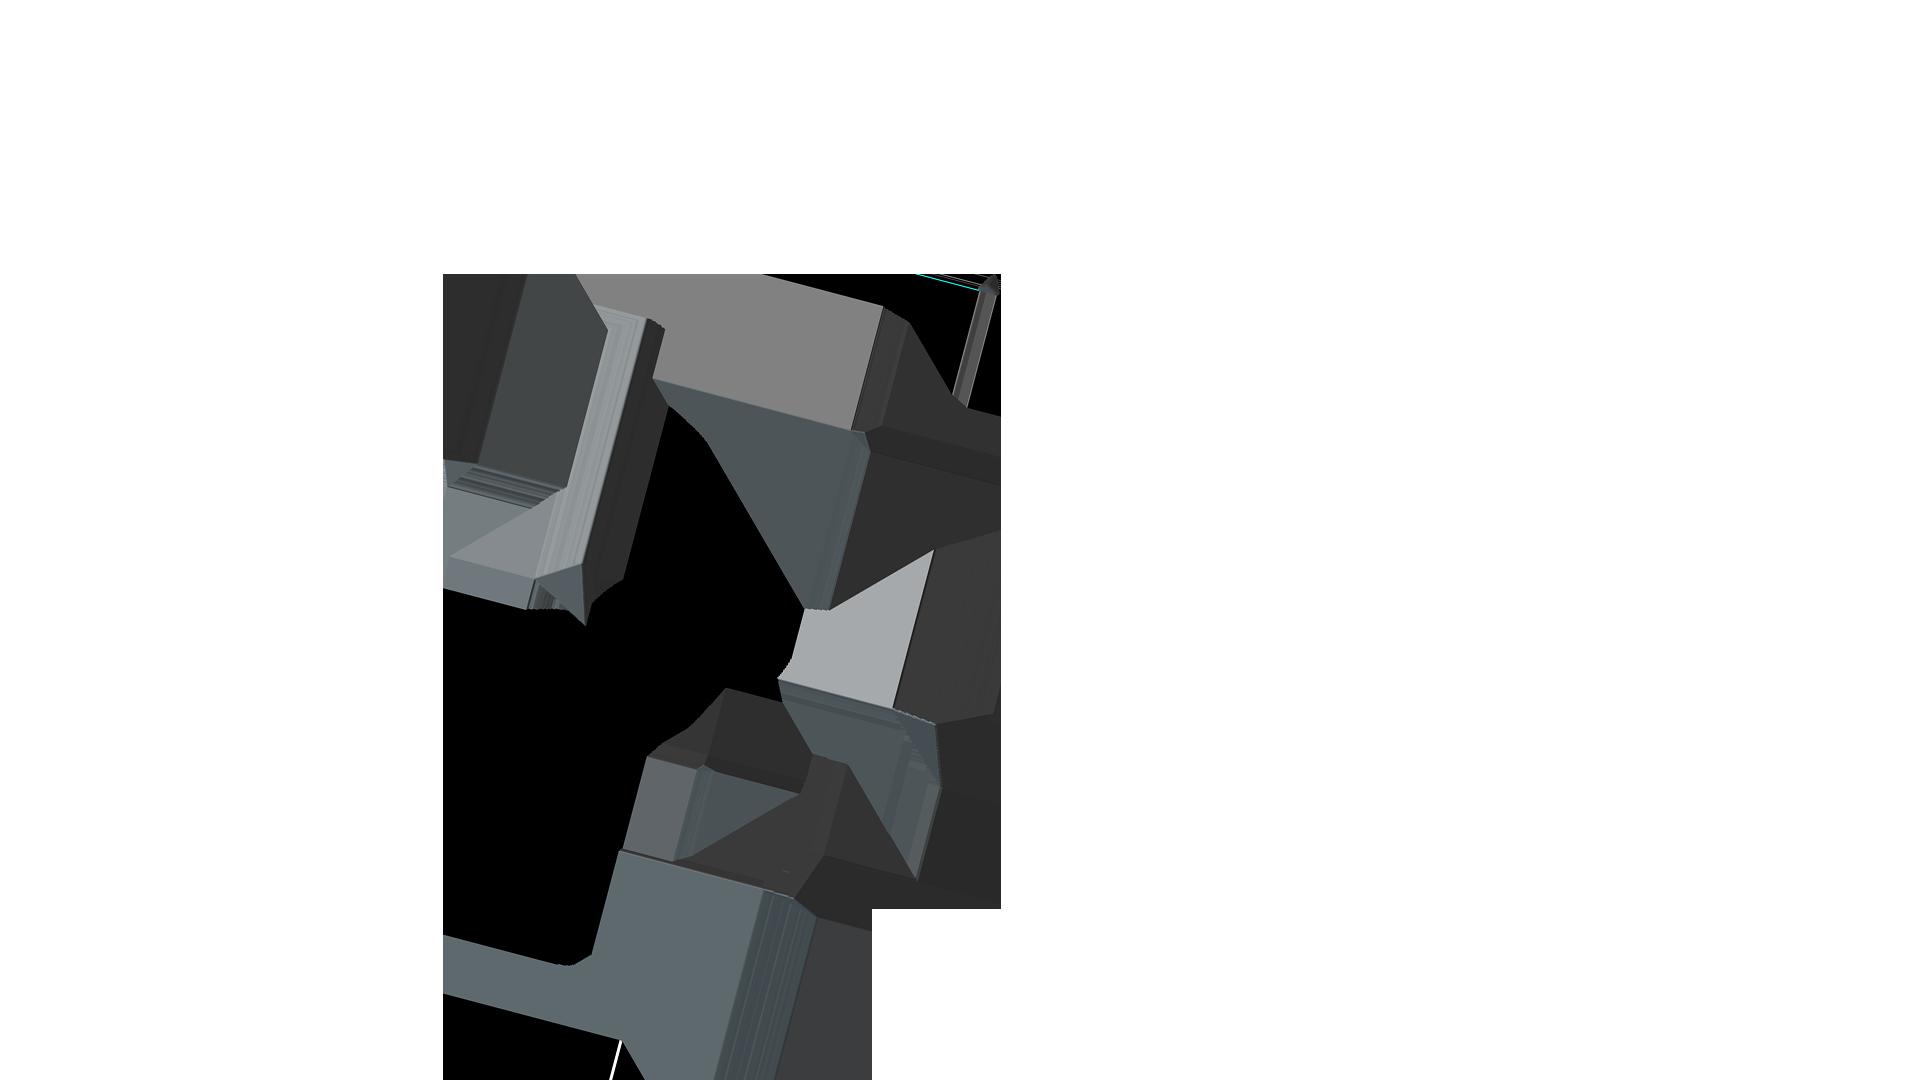 Polygons 905